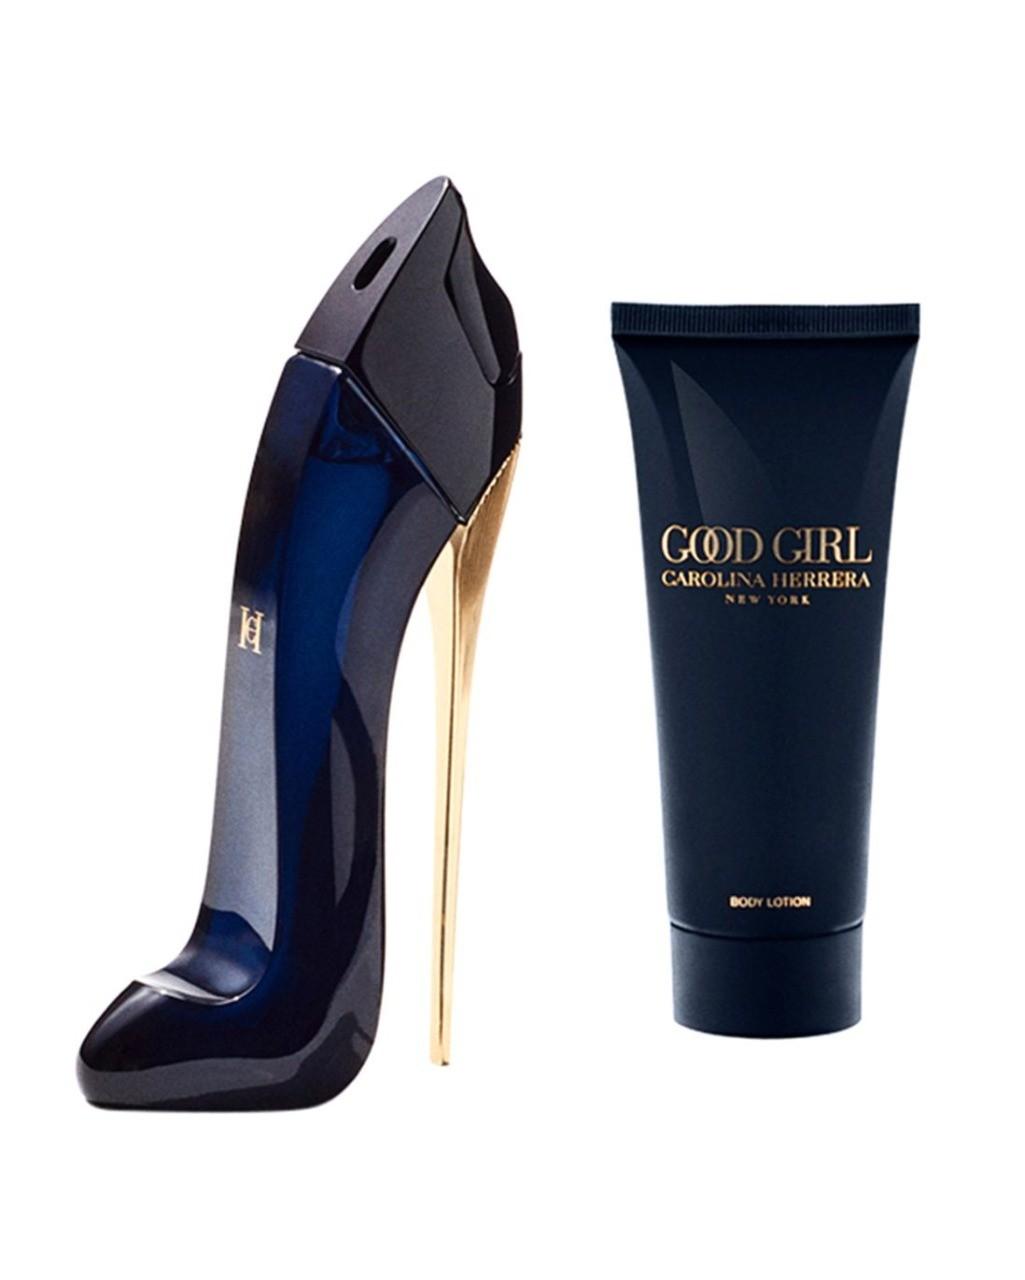 Kit Good Girl Carolina Herrera Feminino Eau de Parfum  80ml + body lotion 100ml